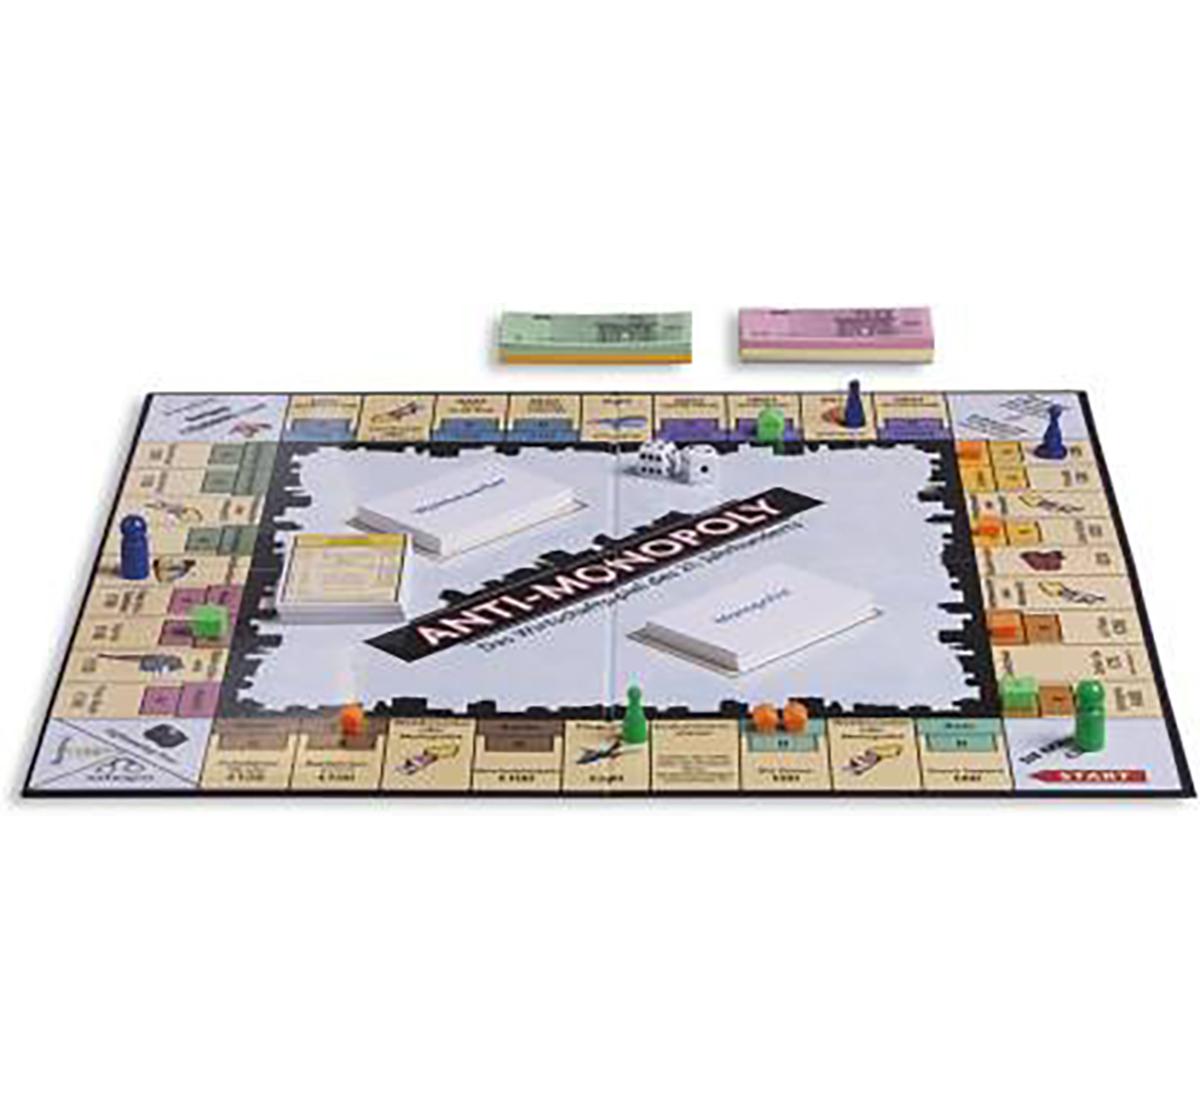 Funskool | Funskool Anti Monopoly- 2 To 6 Players Board Games for Kids age 8Y+